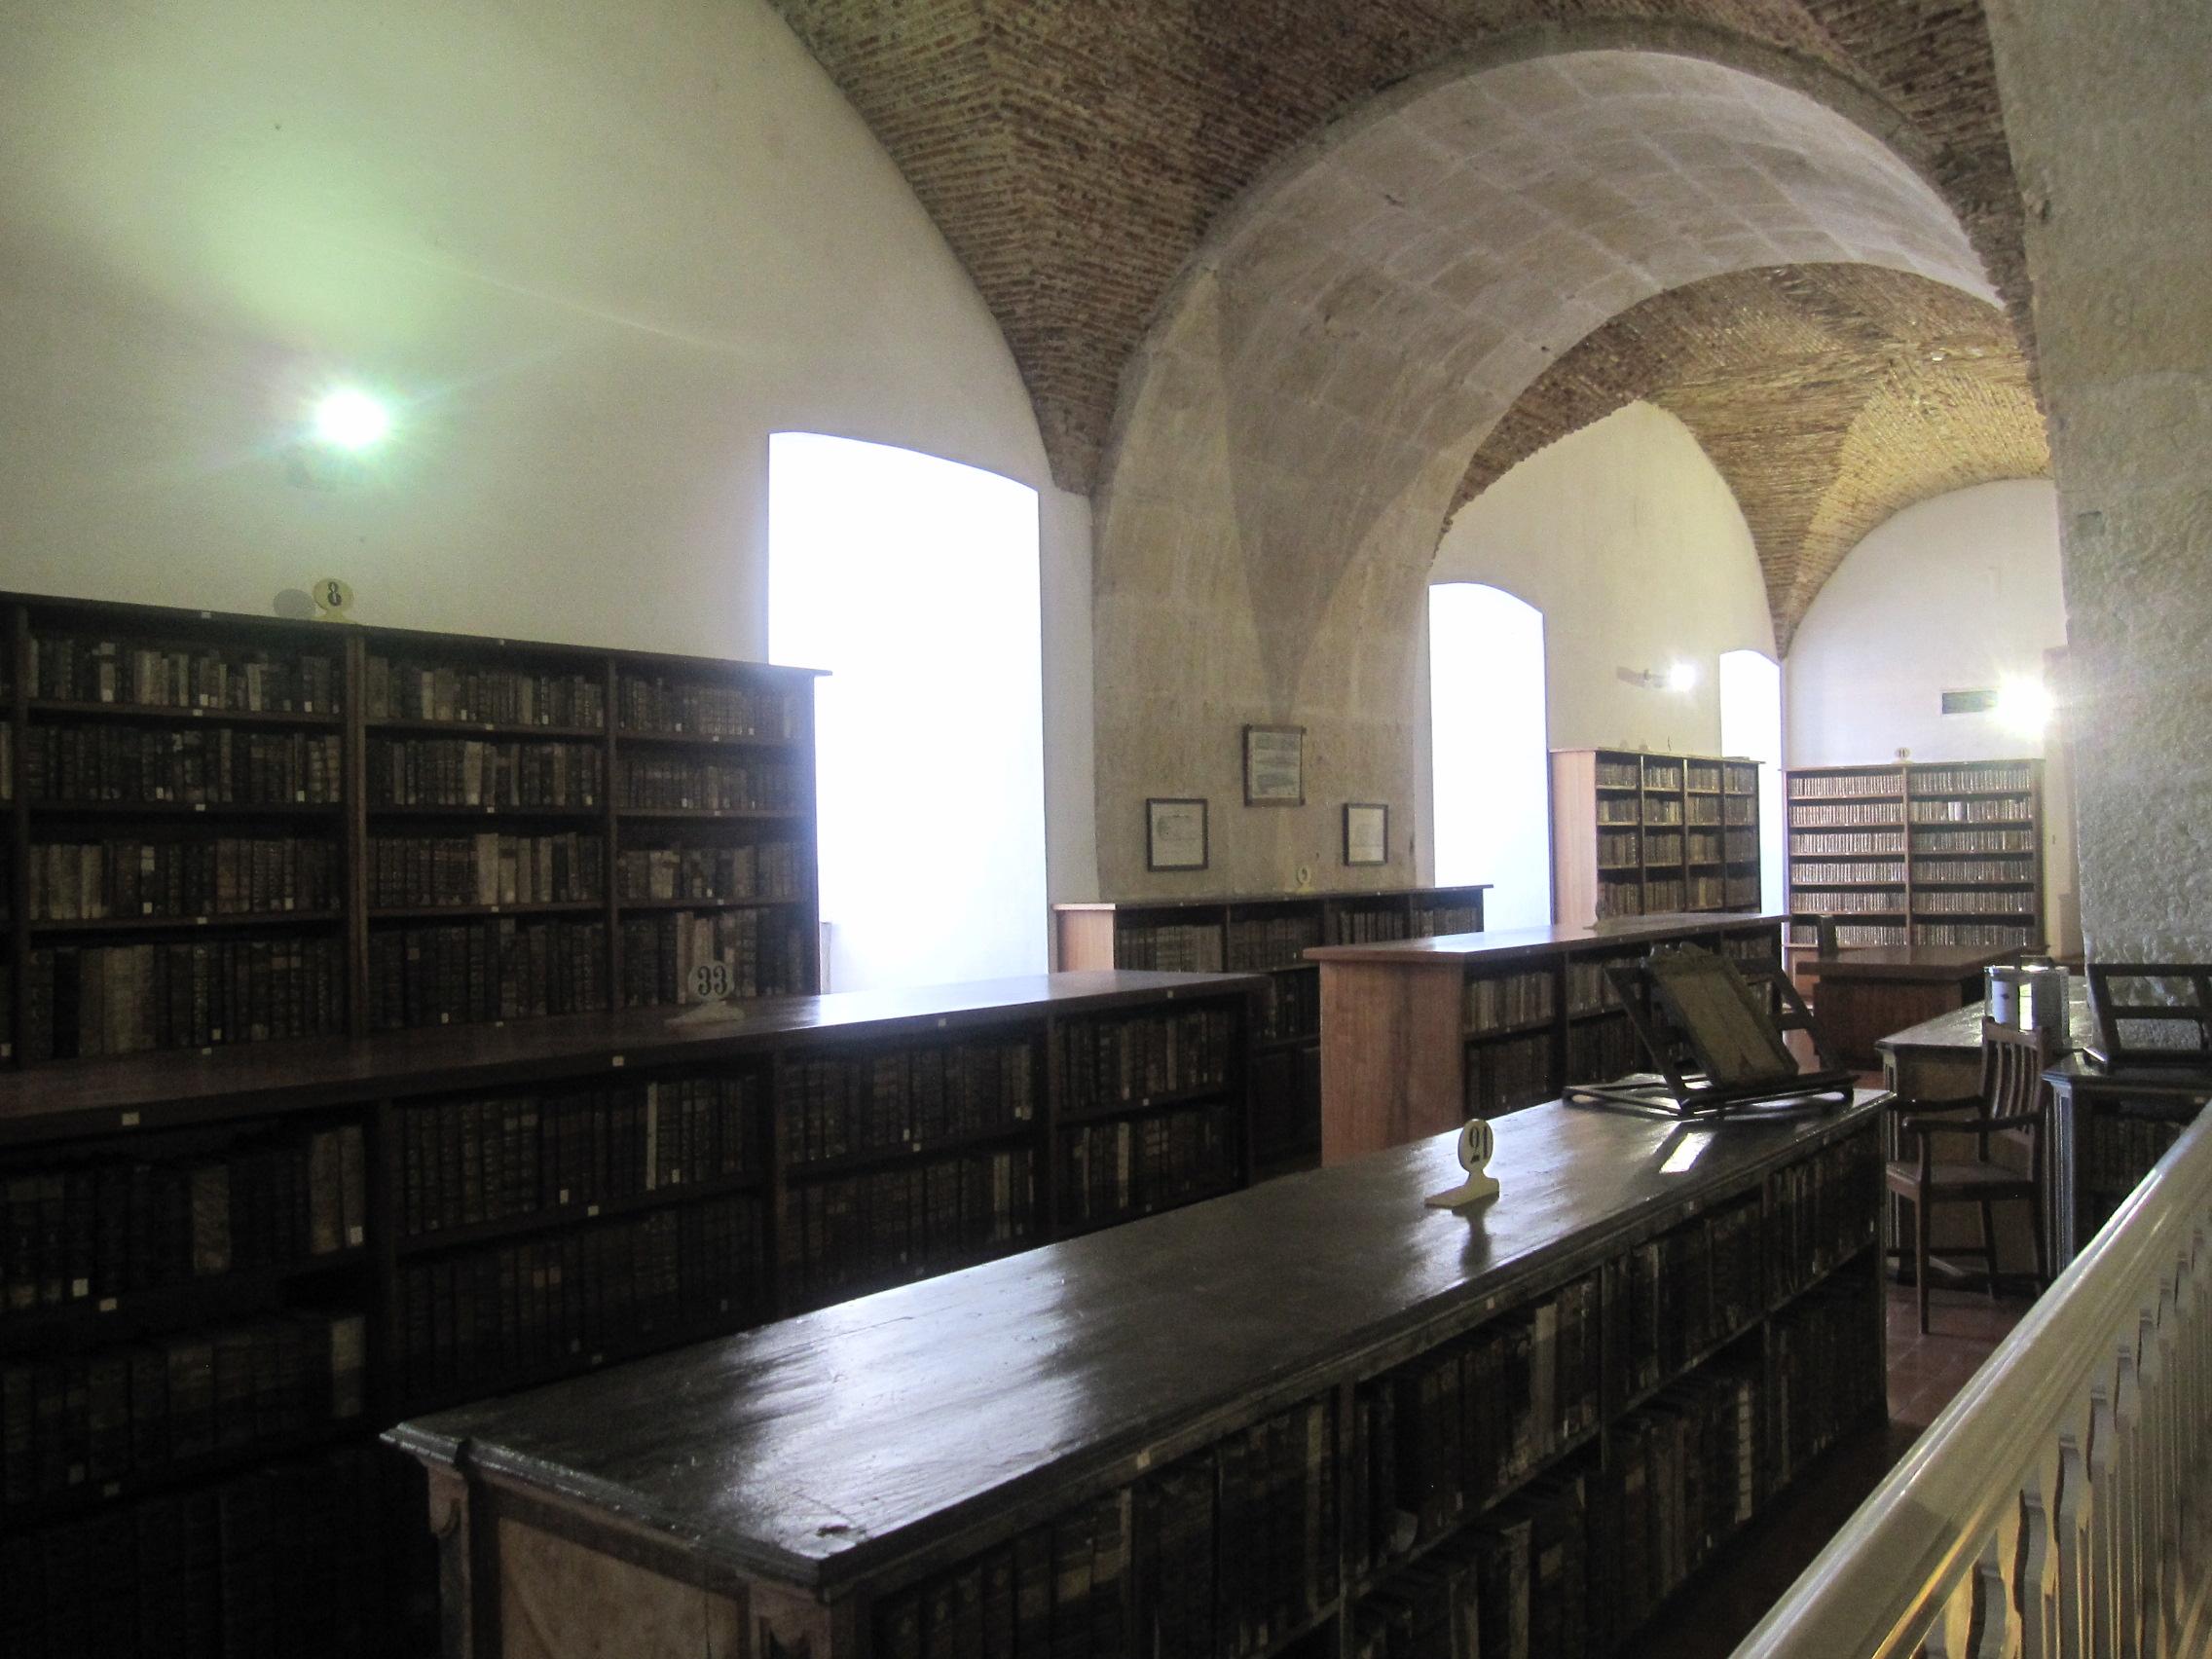 Biblioteca-Joanina-salle-voutee